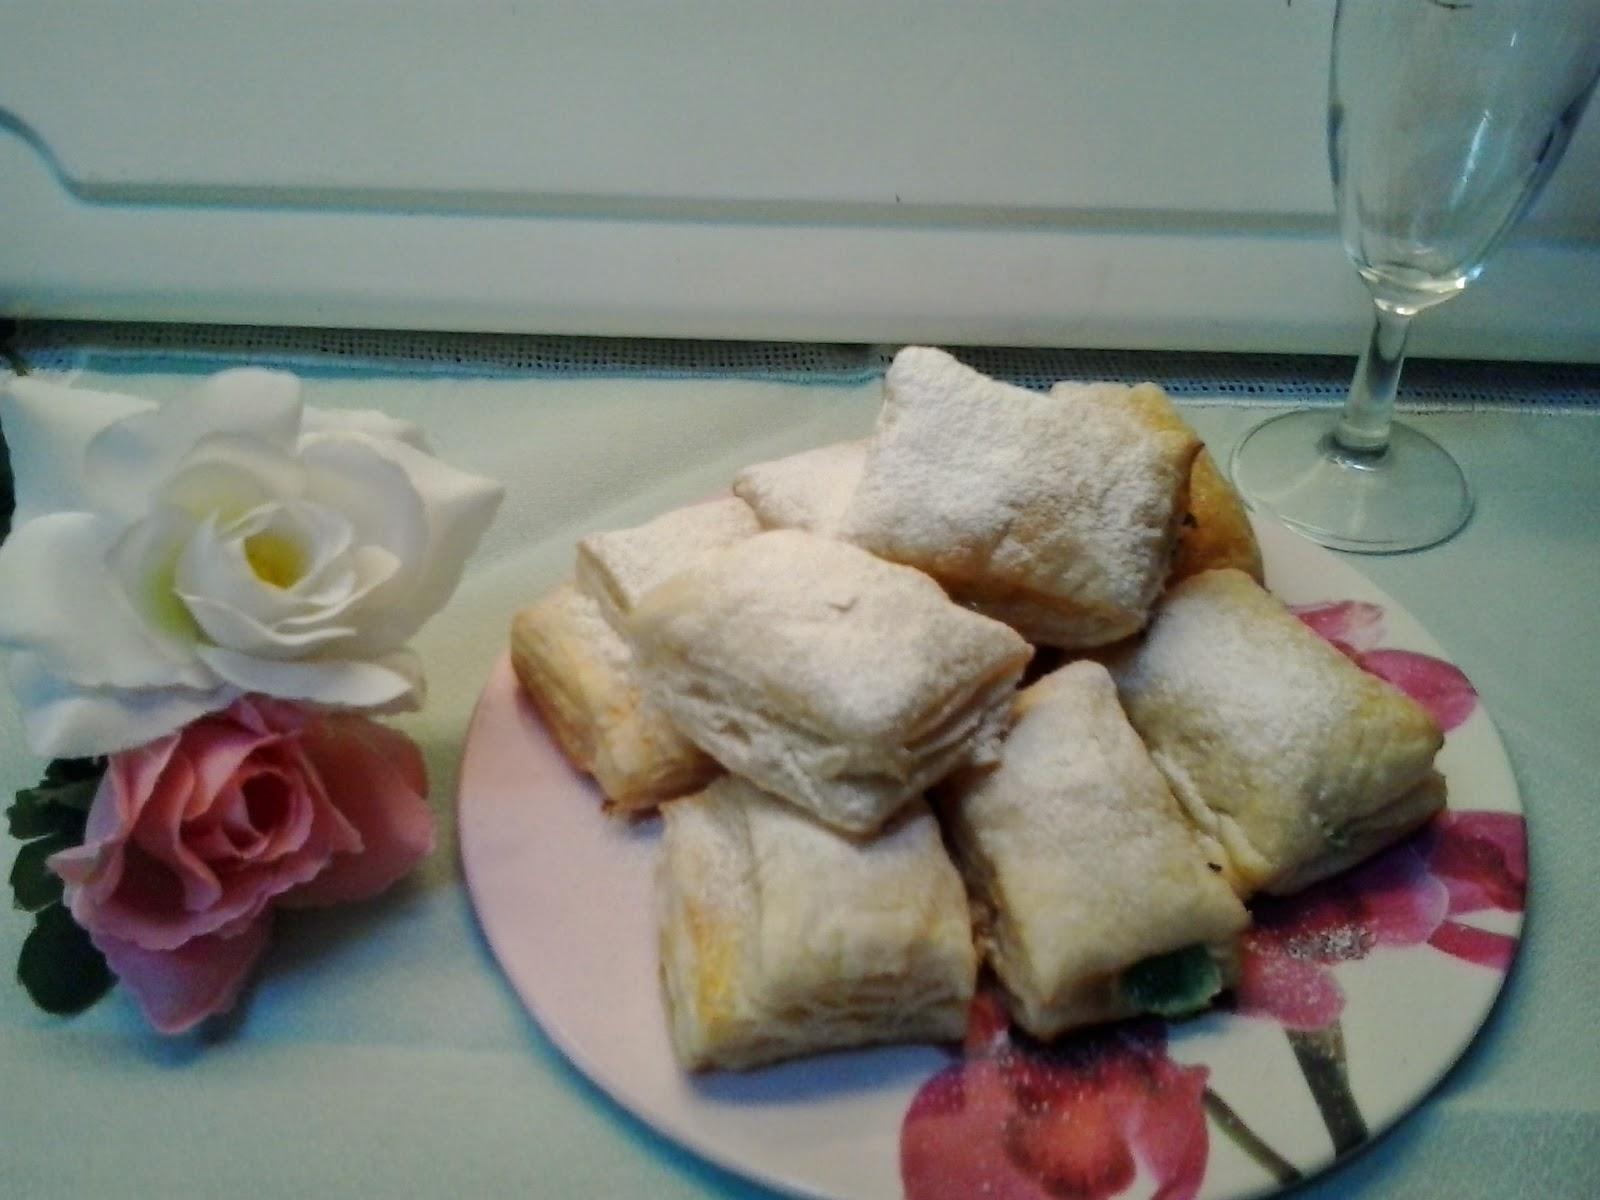 Mi maravilloso rinc n de reposter a creativa cuadraditos - Ingredientes reposteria creativa ...